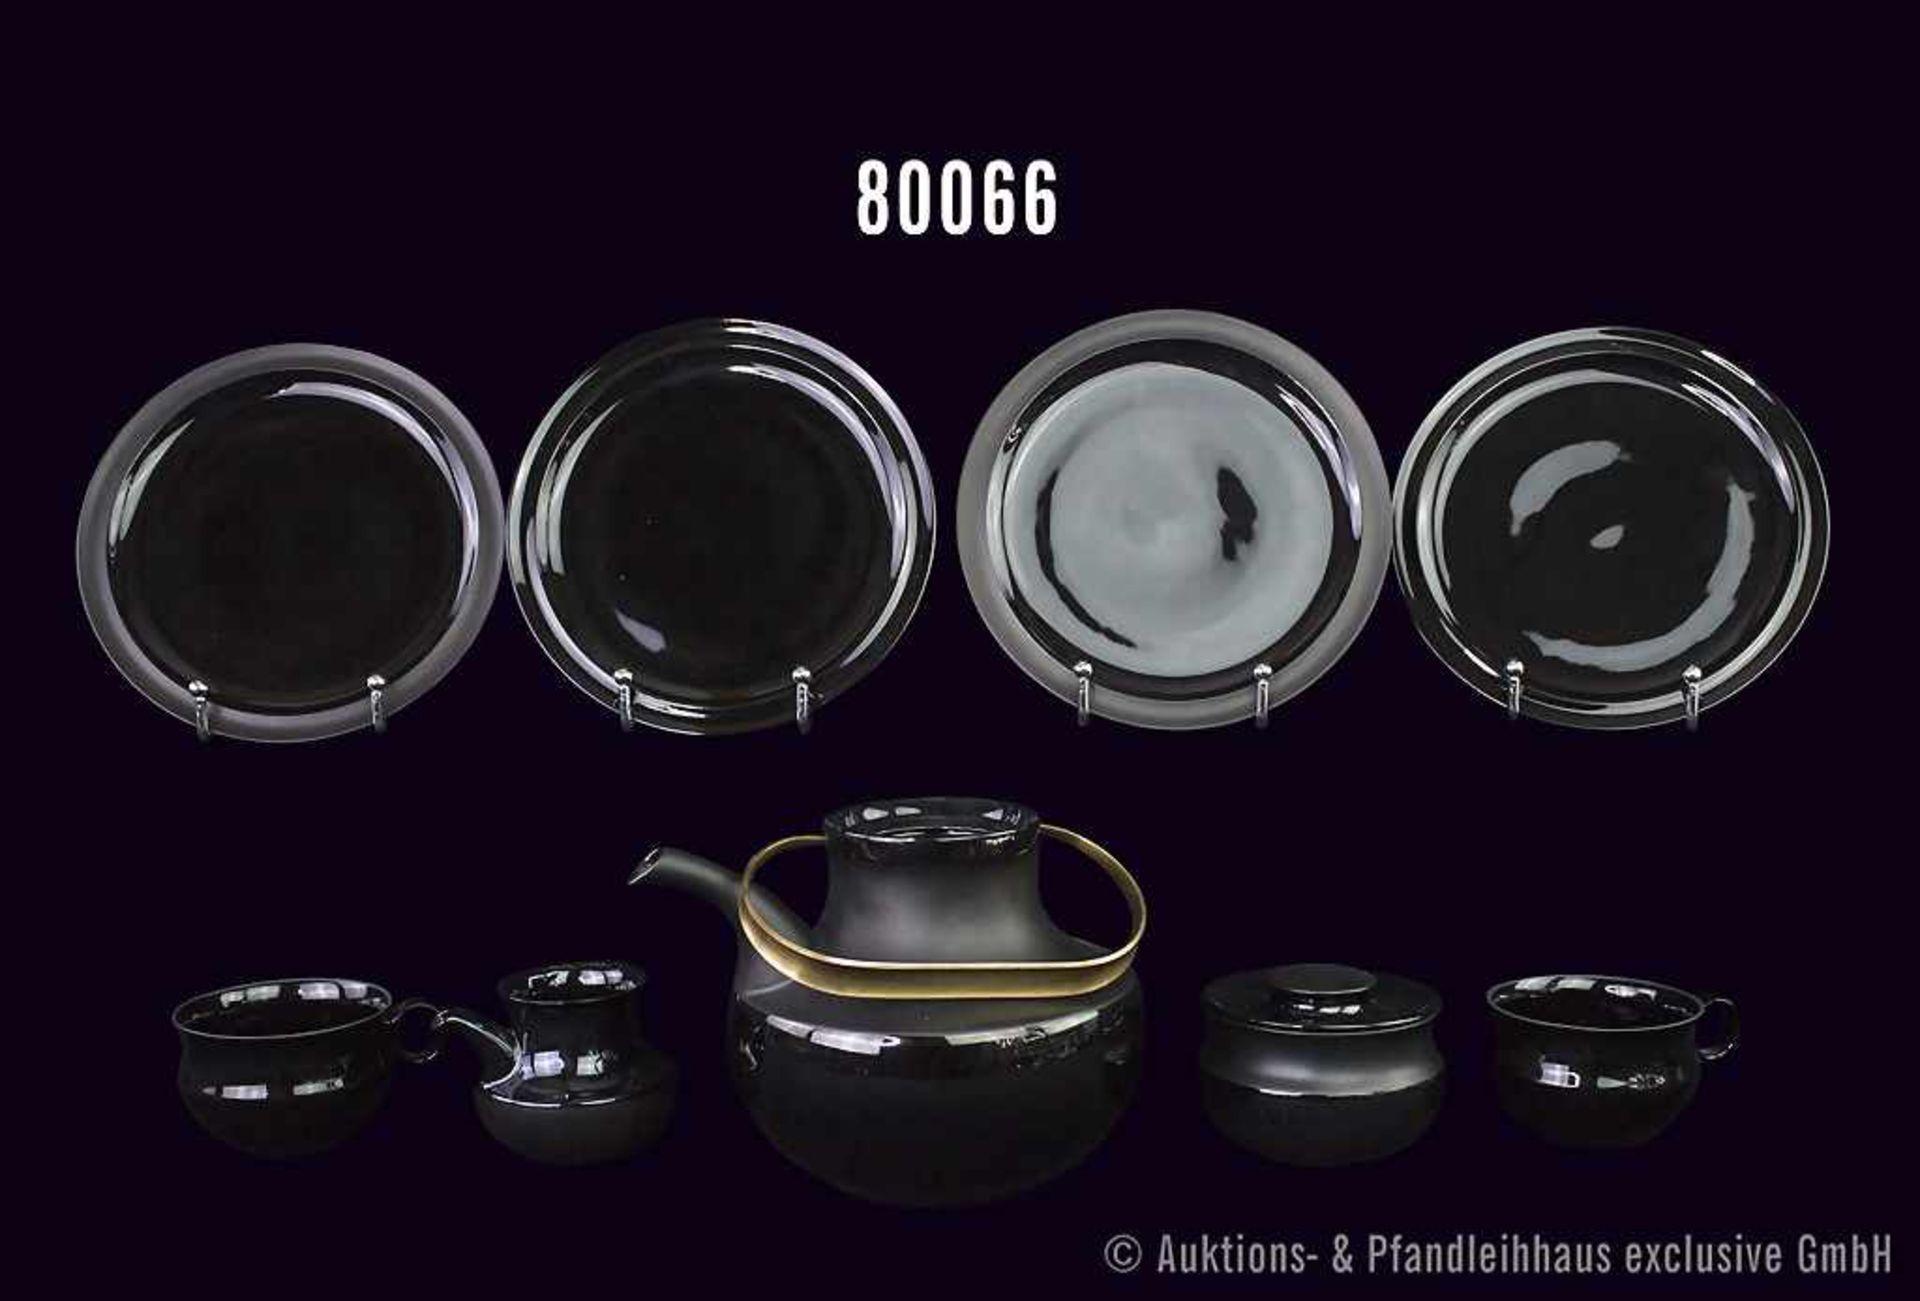 Konv. 14 Teile Rosenthal Porzellan, Tee-Service Assam, schwarz, Künstler Taipo Wirkkala, dabei 1